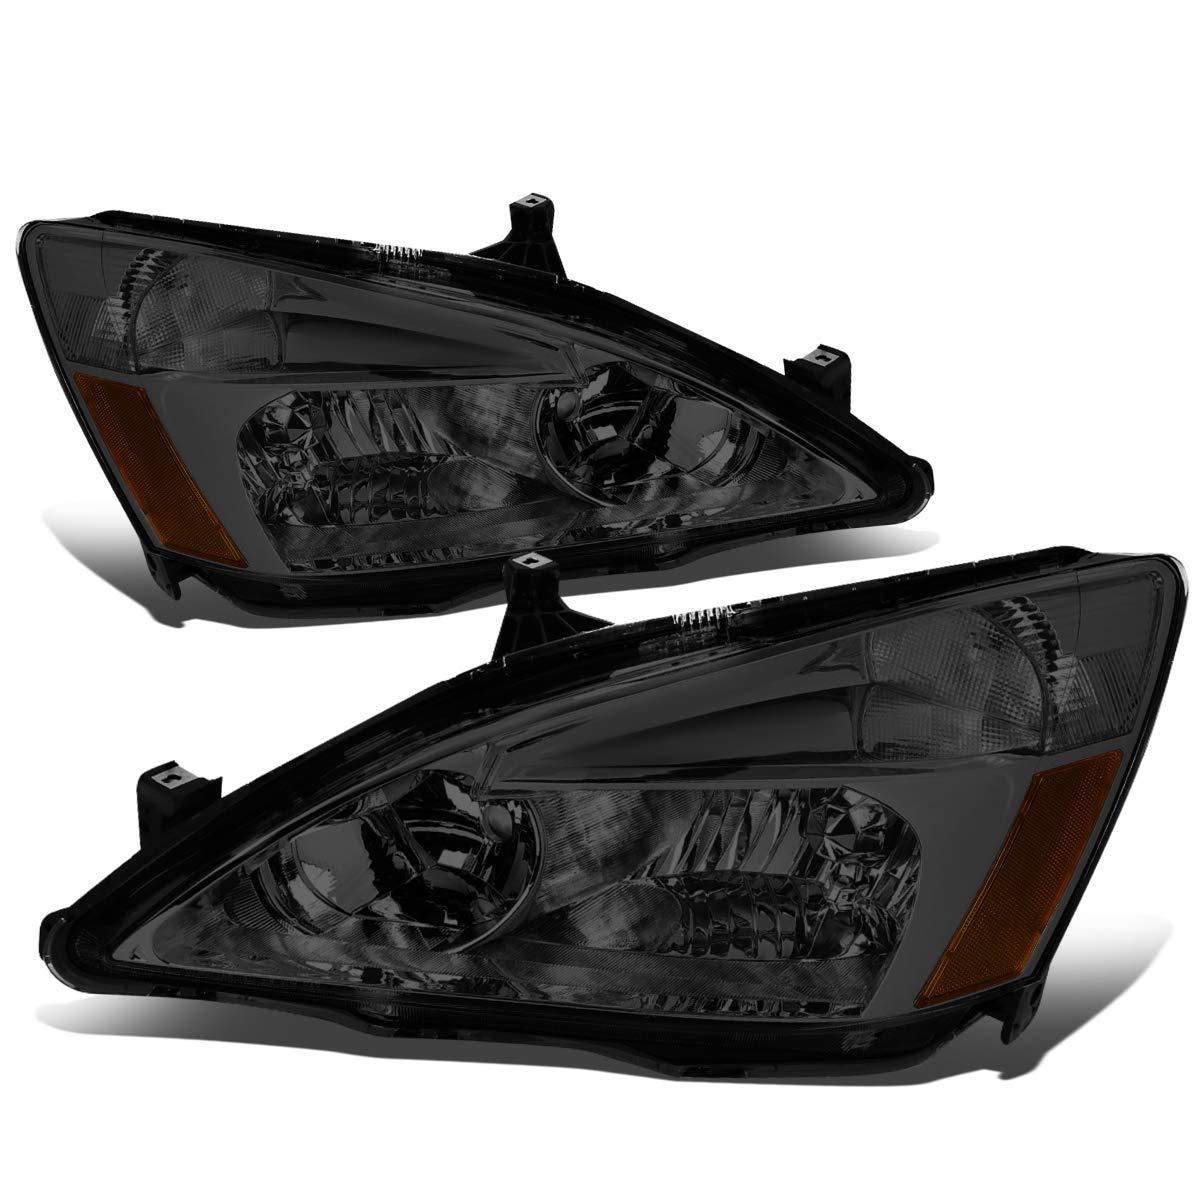 Replacement for 03-07 Honda Accord Pair of Smoke Lens Amber Corner Replacement Headlights/Lamps